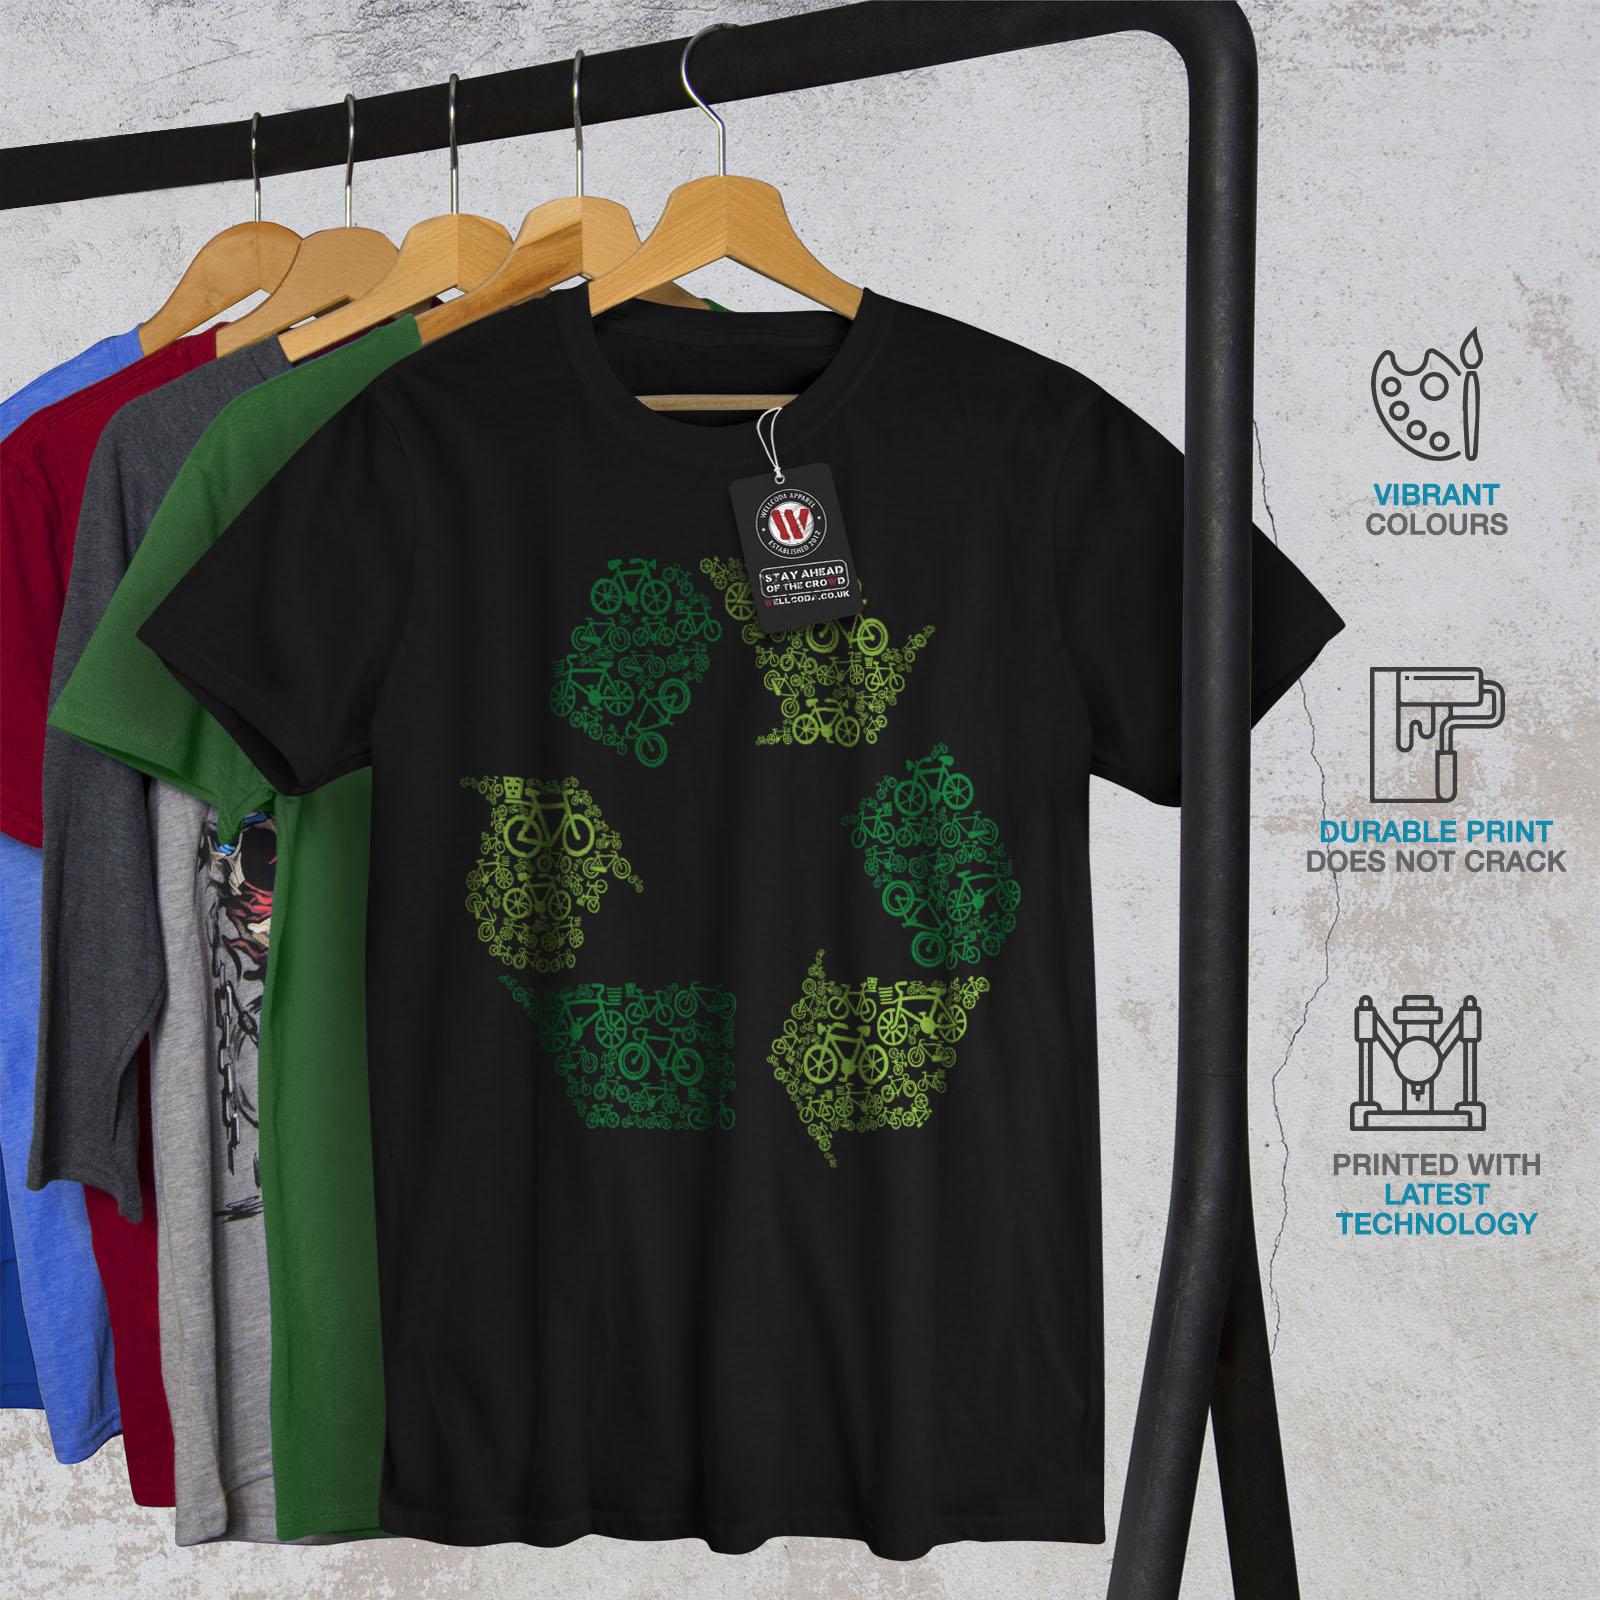 55d09e76 Wellcoda Green Art Eco Funny Mens T-shirt, Graphic Design Printed ...